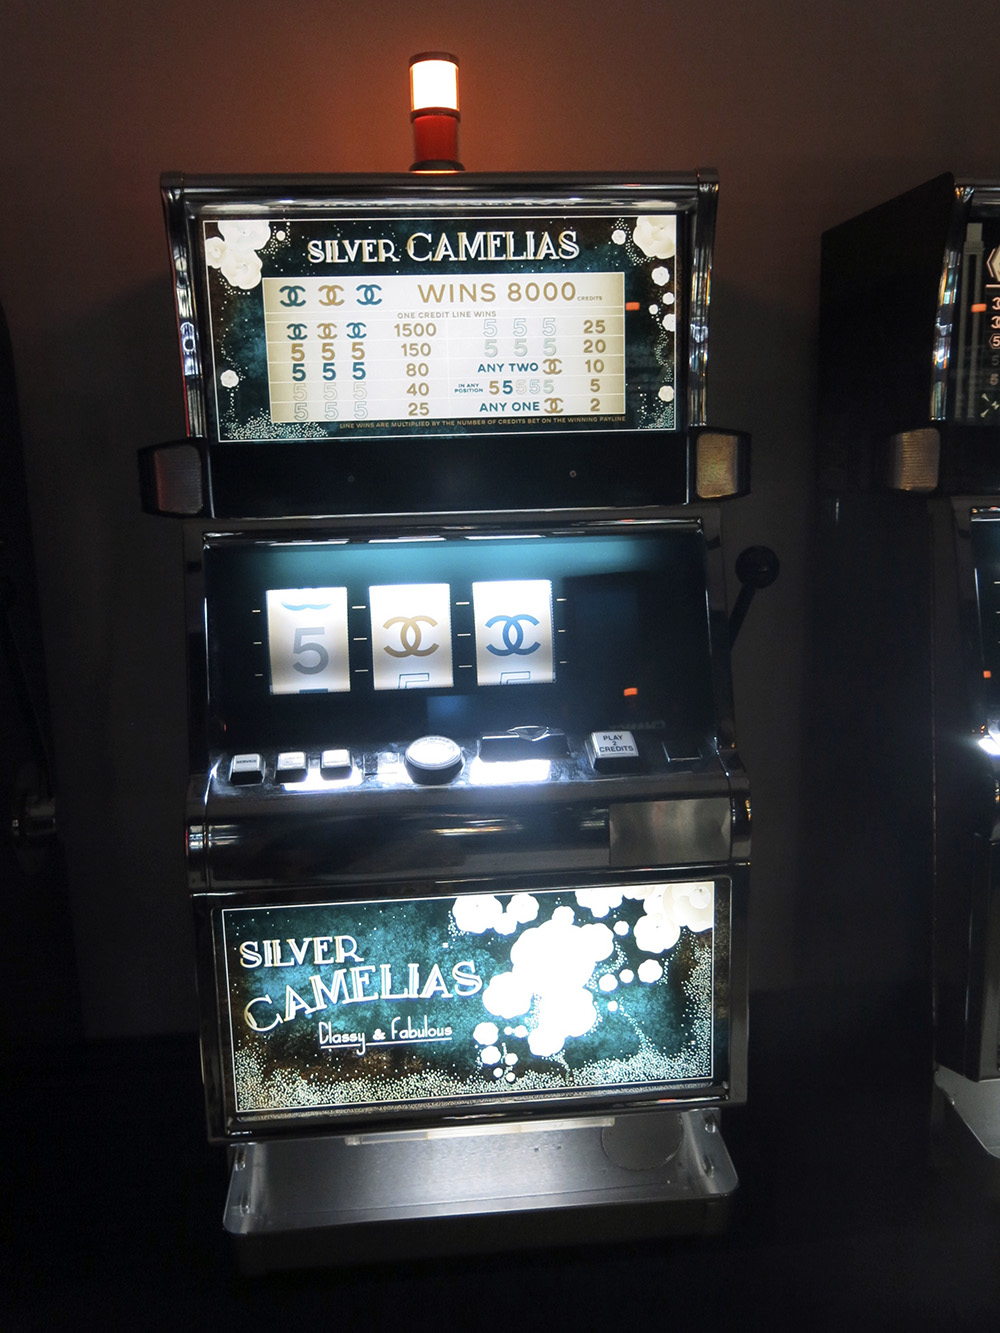 Chanel silver camelias slot machine